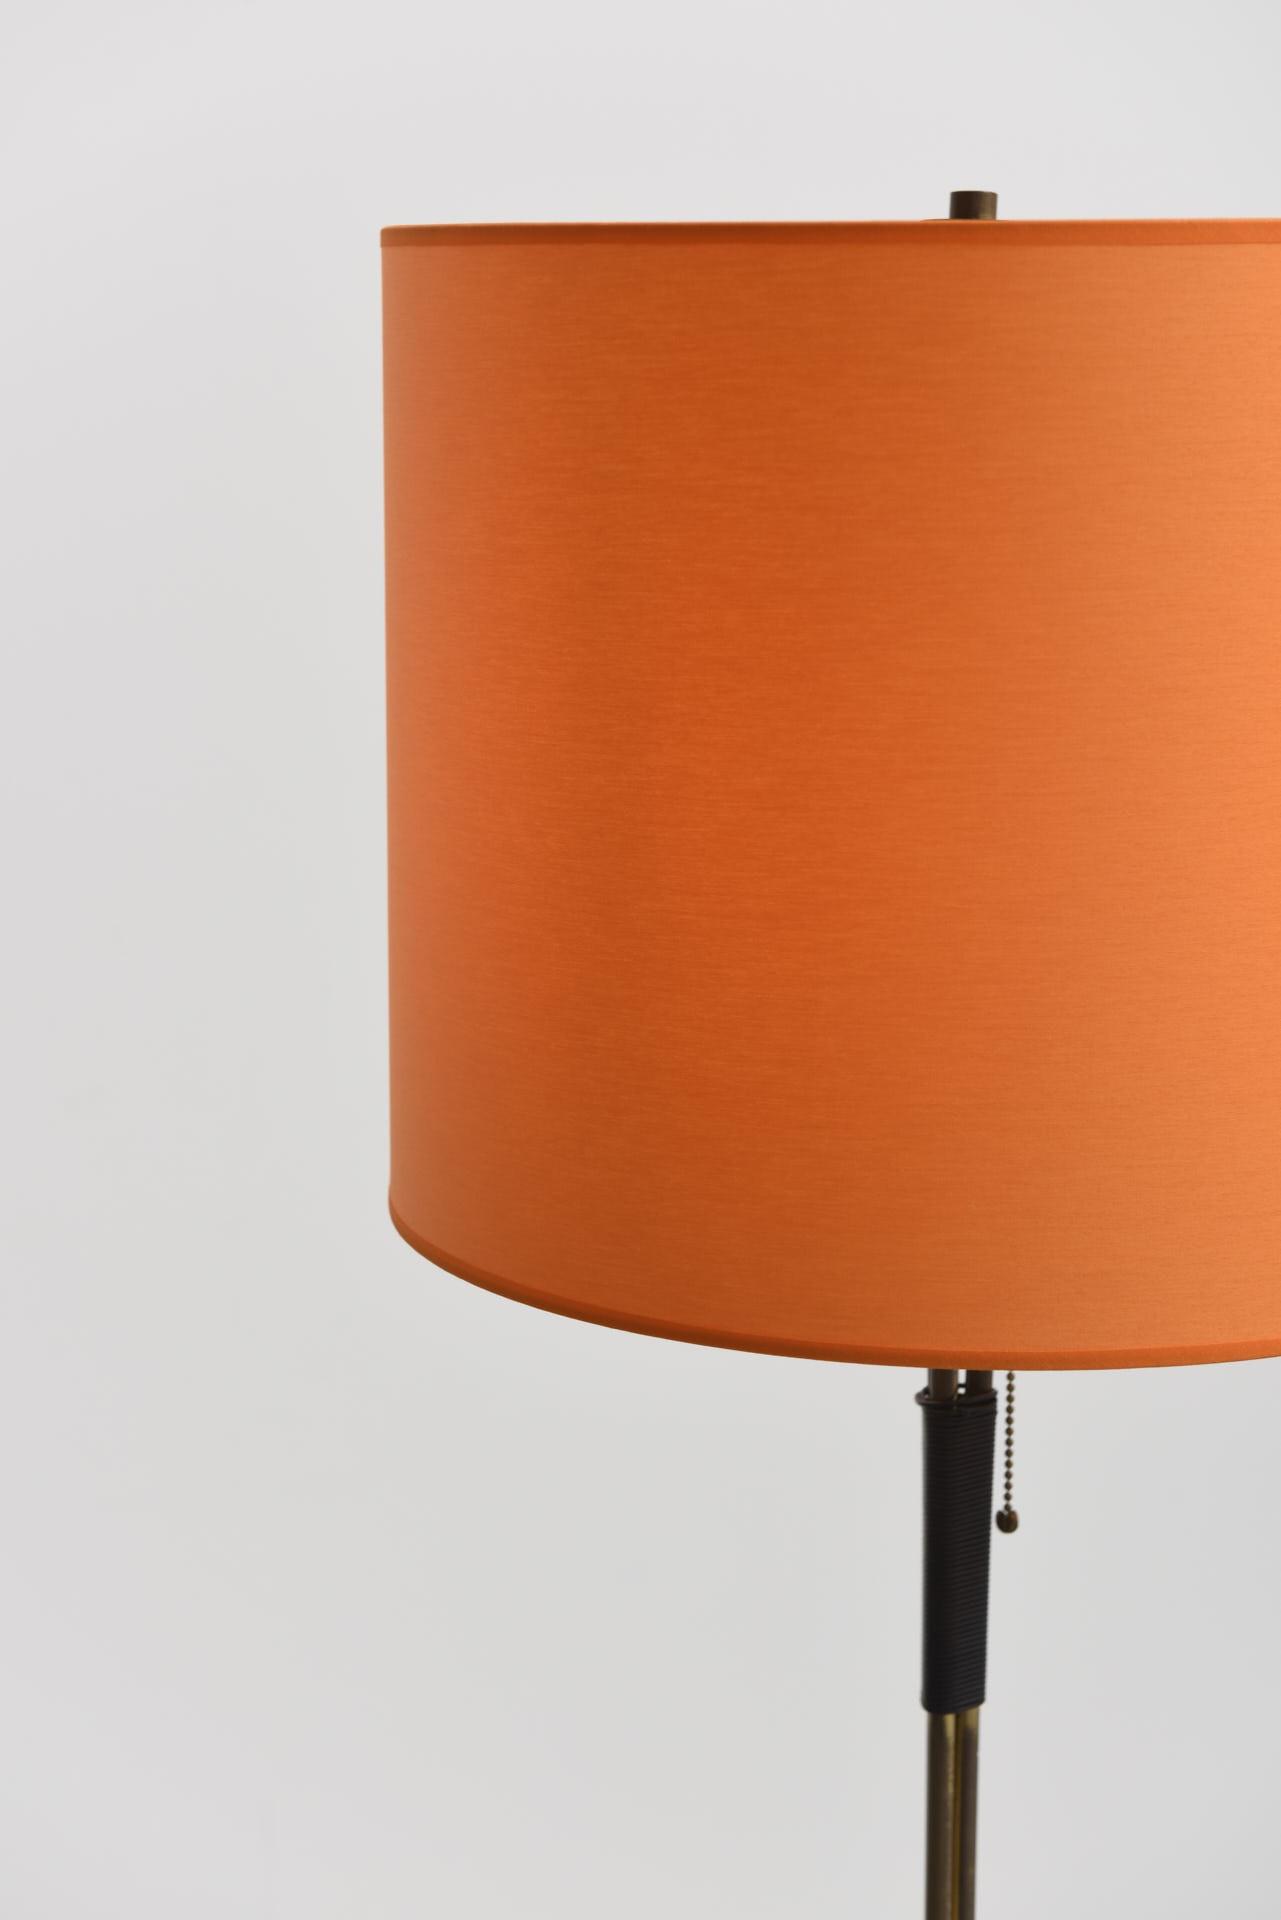 Vintage brass floor lamp with orange lamp shade 1950s design market lamp shade 1950s previous next aloadofball Choice Image